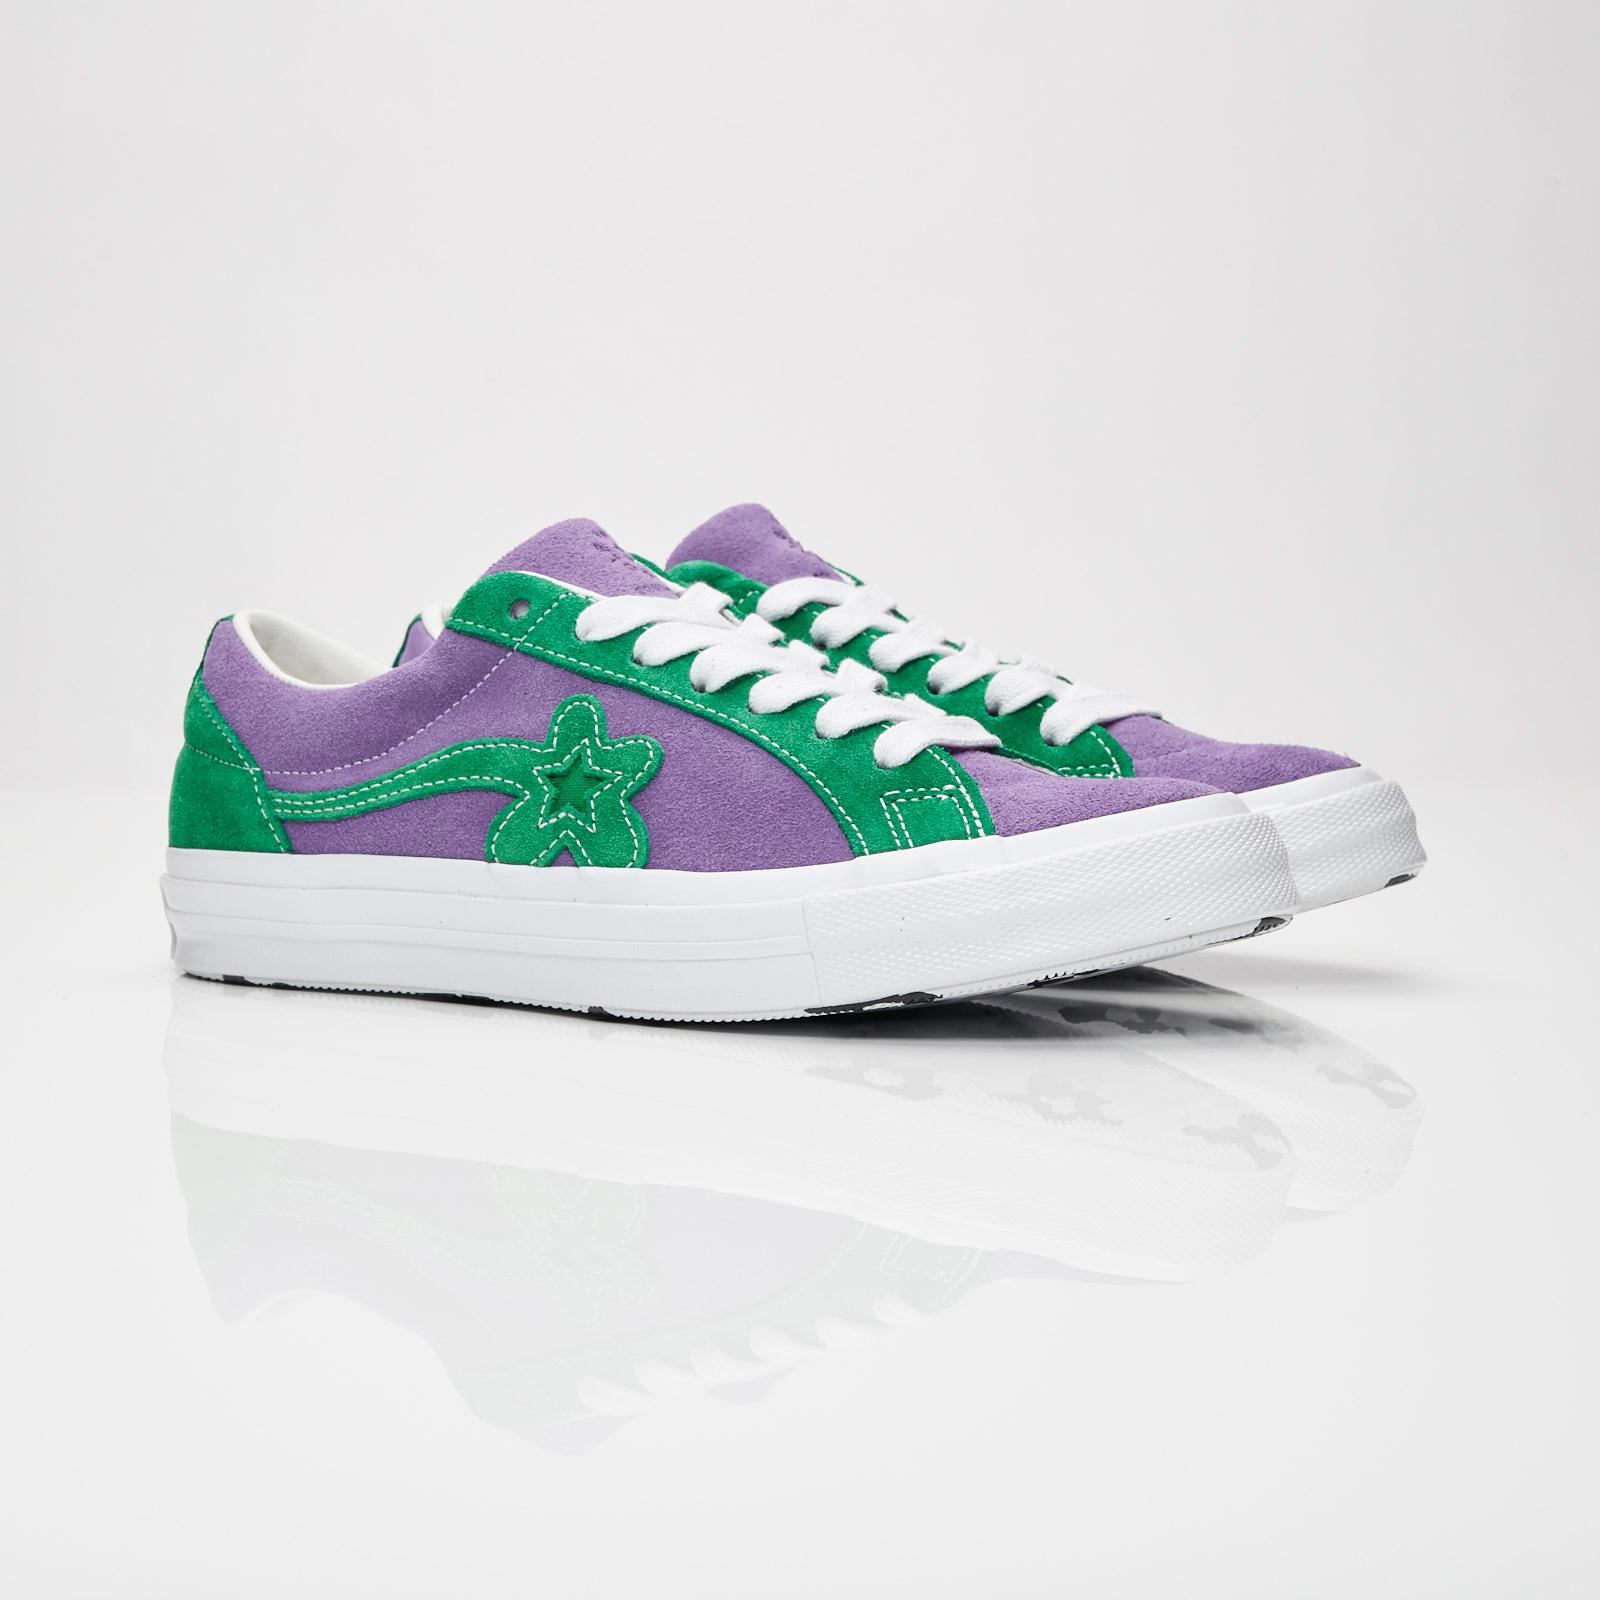 40fe880ea74 Converse One Star x Golf Le Fleur - 162128c - Sneakersnstuff ...